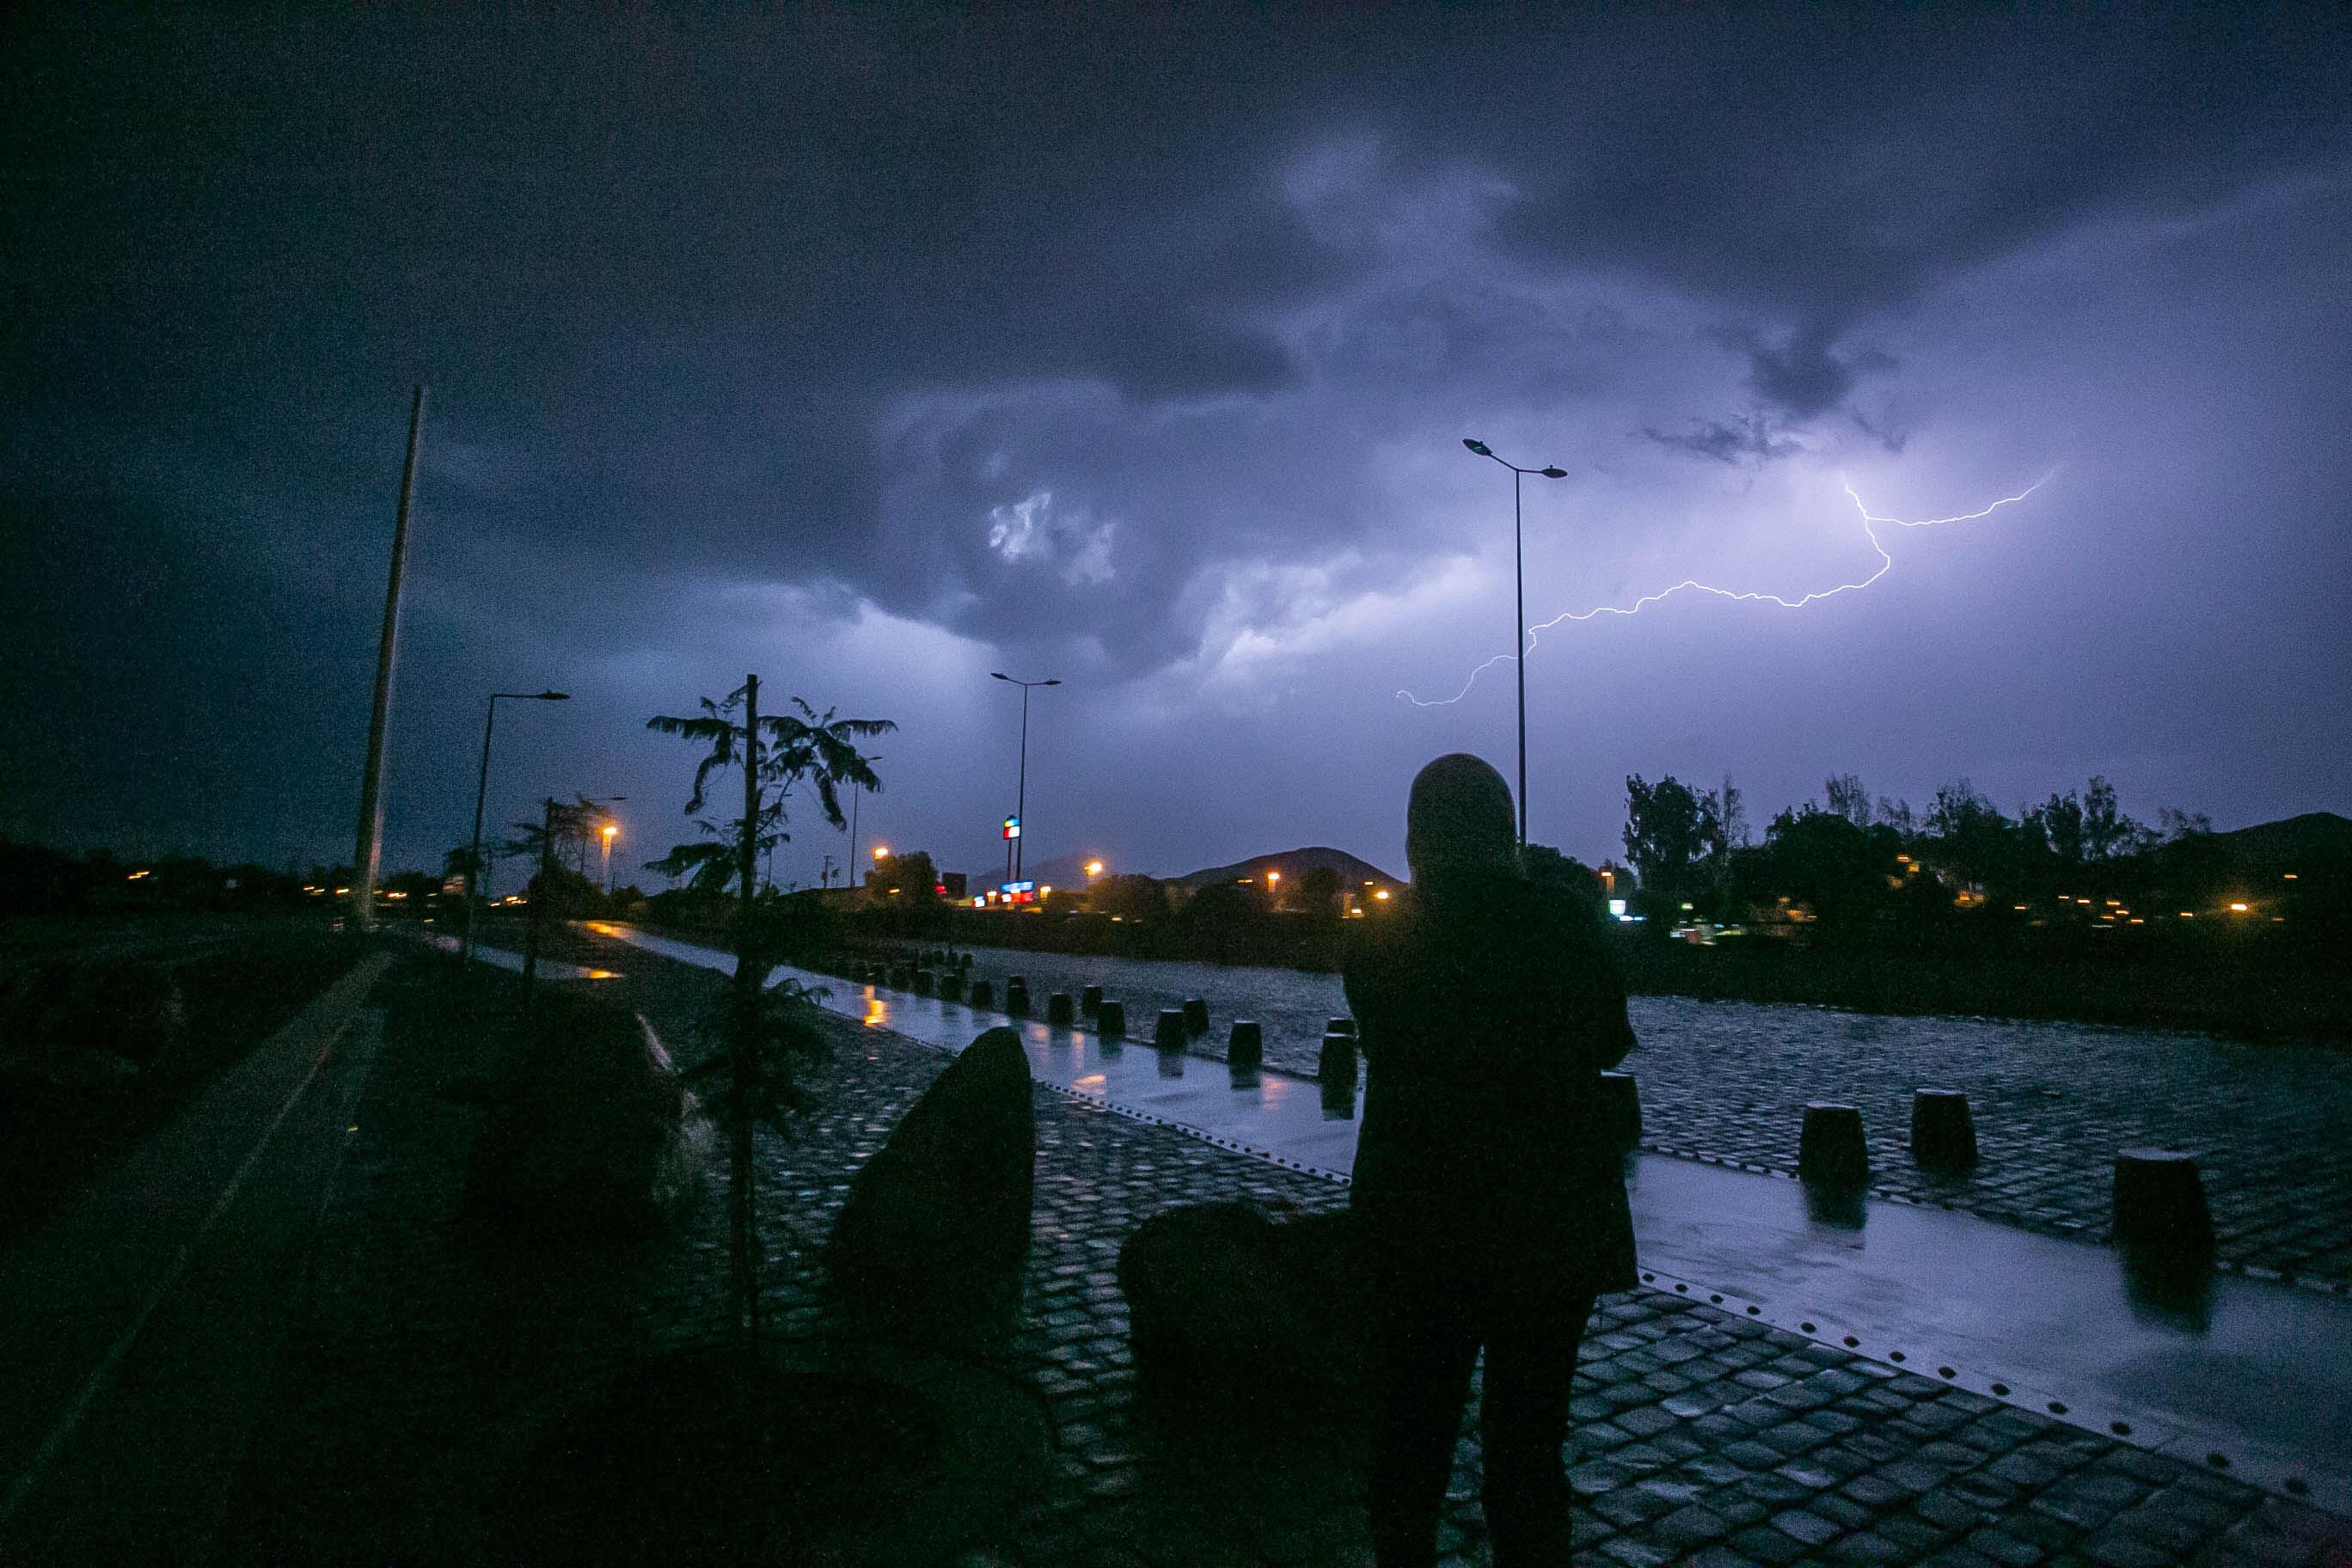 Aviso de tormentas eléctricas entre Coquimbo y O'Higgins